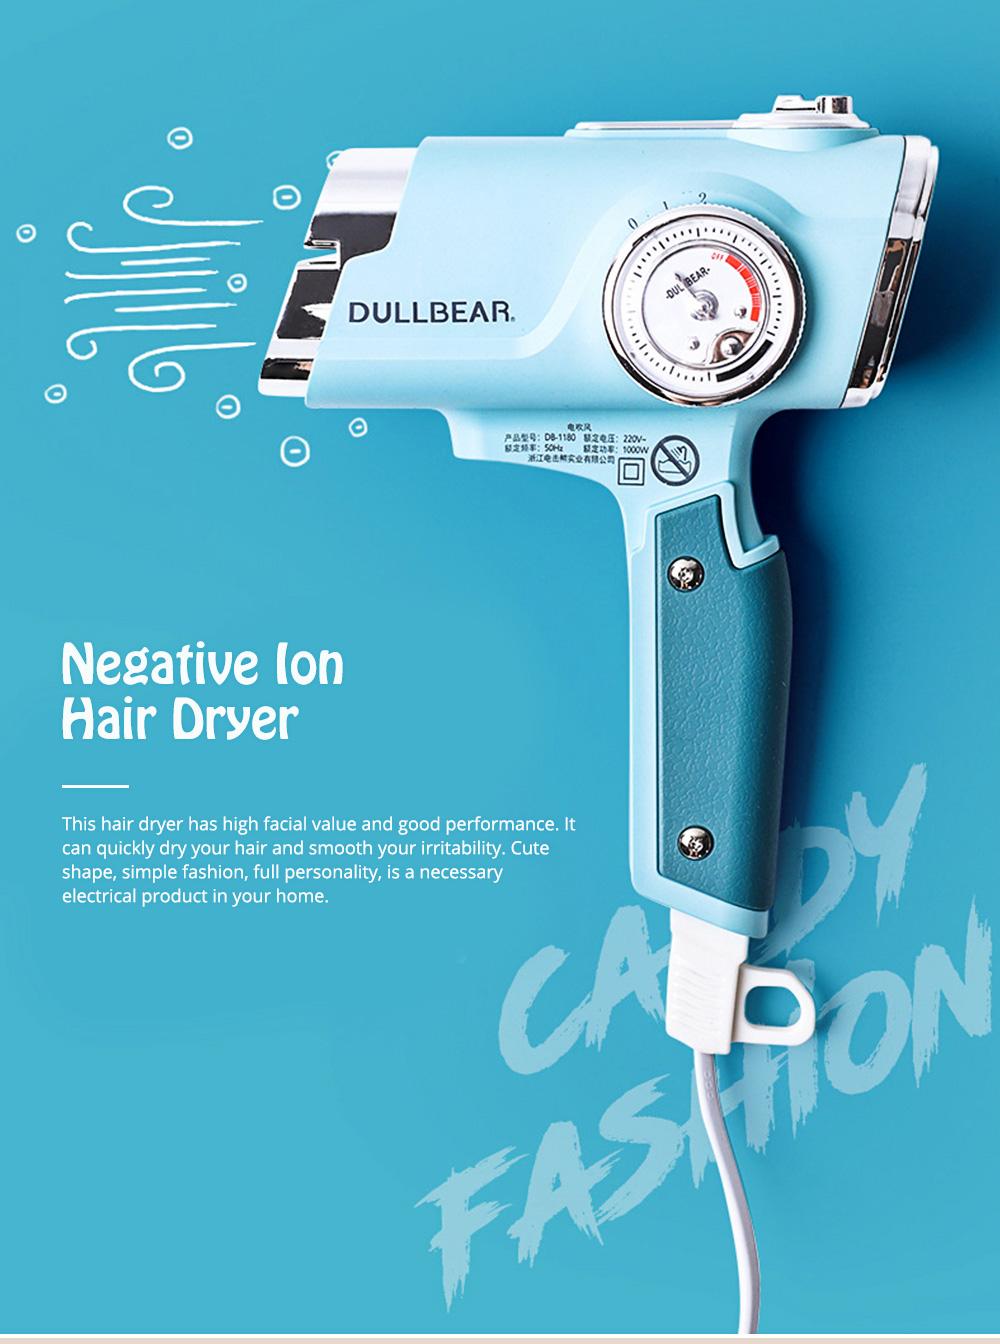 DULLBEAR Negative Ion Hair Dryer Small Portable Folding Home Travel Hairdryer 0